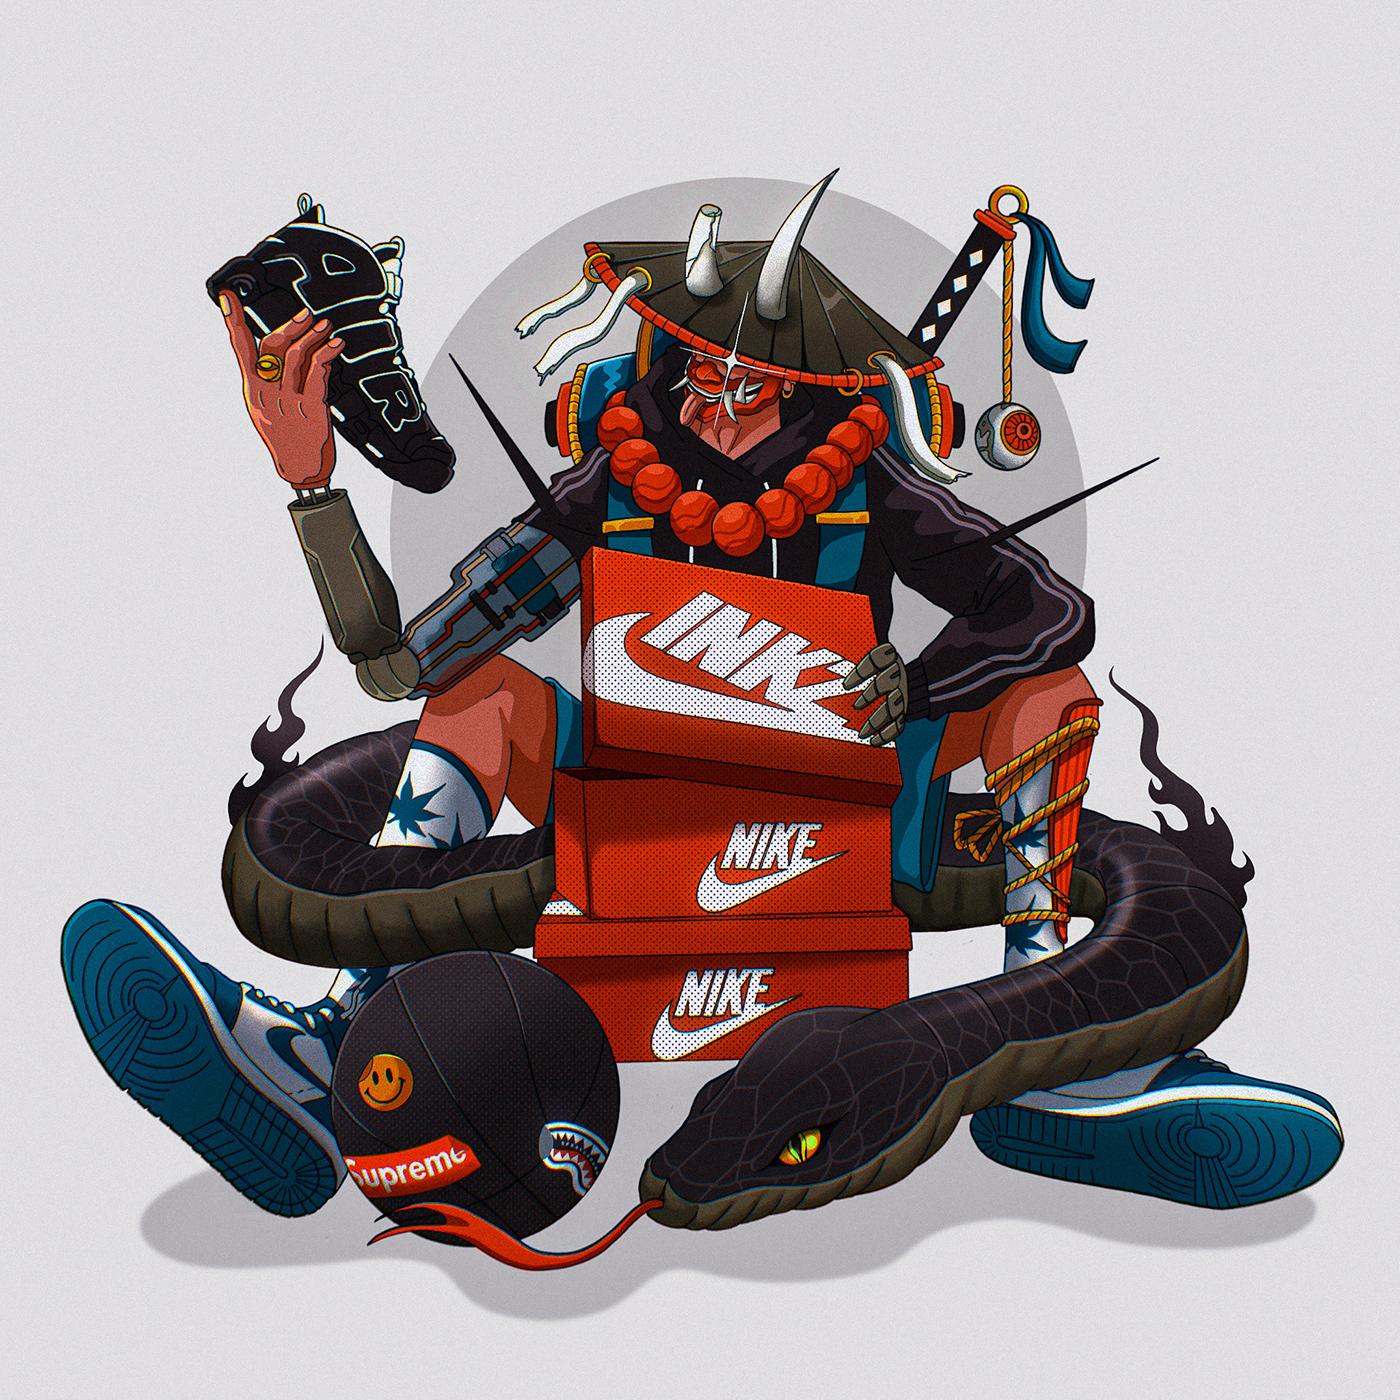 artwork Character design  Digital Art  hypebeast ILLUSTRATION  Nike Procreate sketch sneakers streetwear